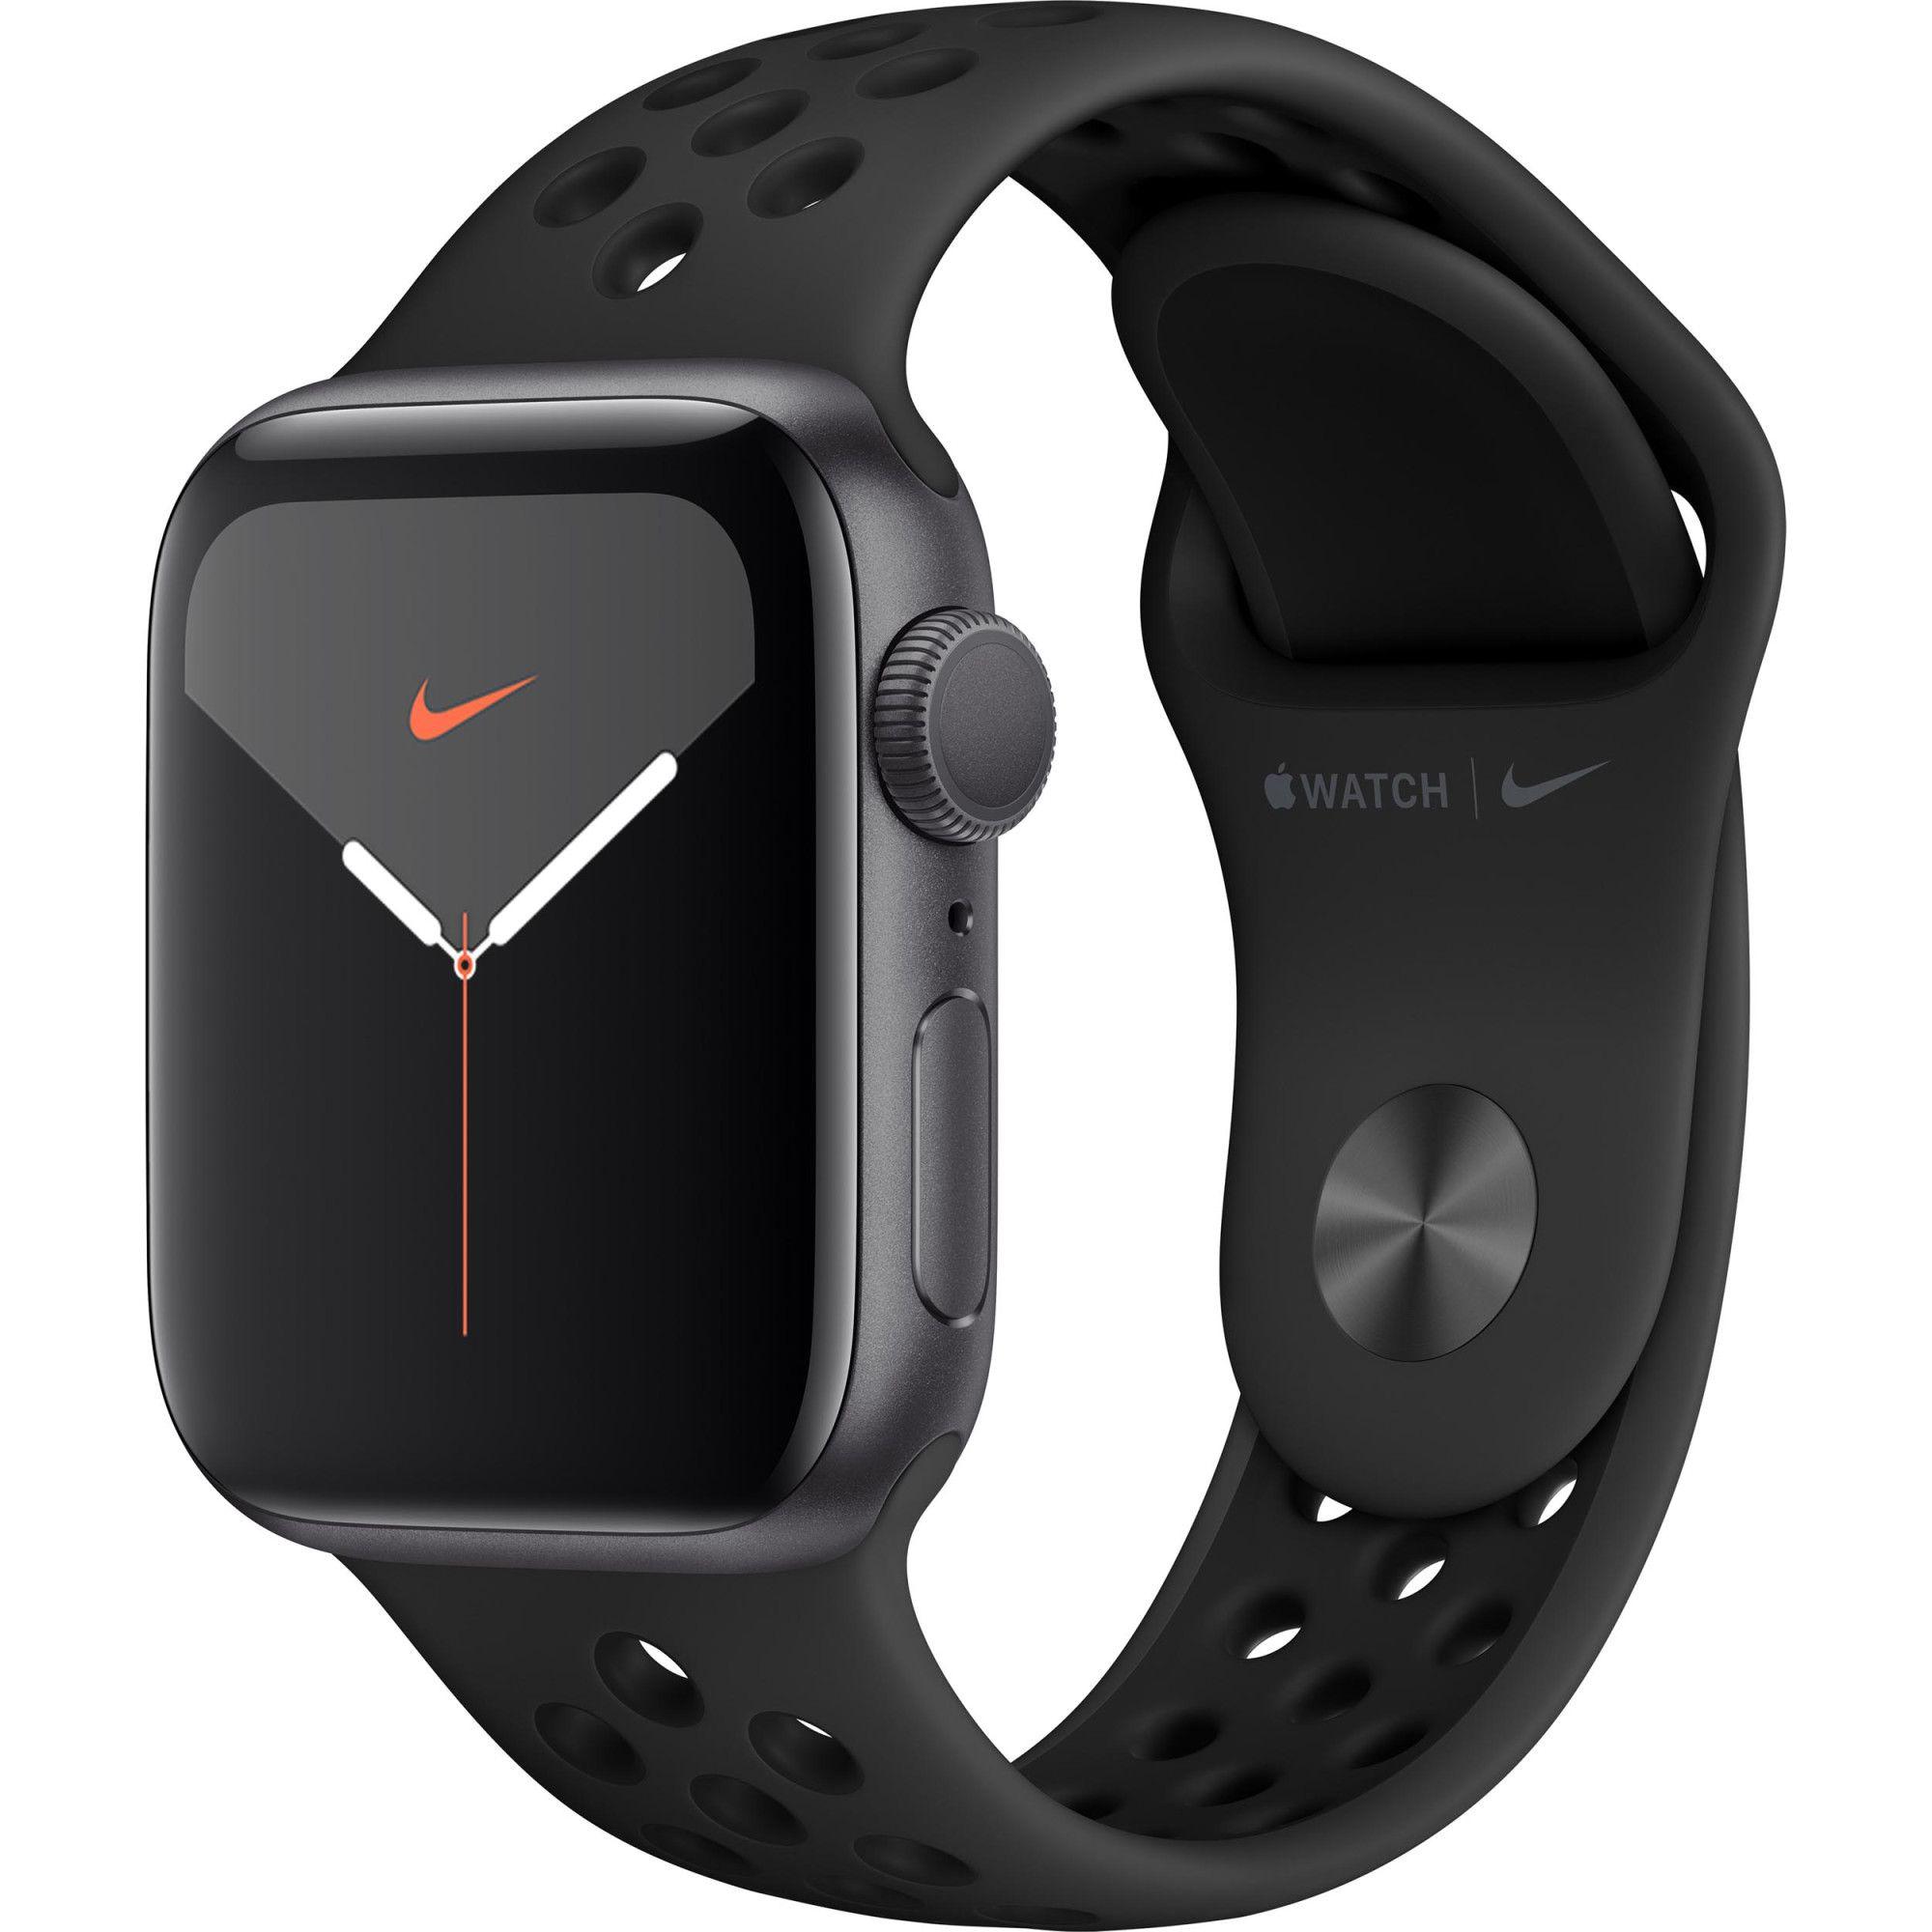 Smartwatch Apple Watch Nike 5 GPS 40mm 4G Carcasa Space Gray Aluminium Bratara Anthracite/Black Nike Sport